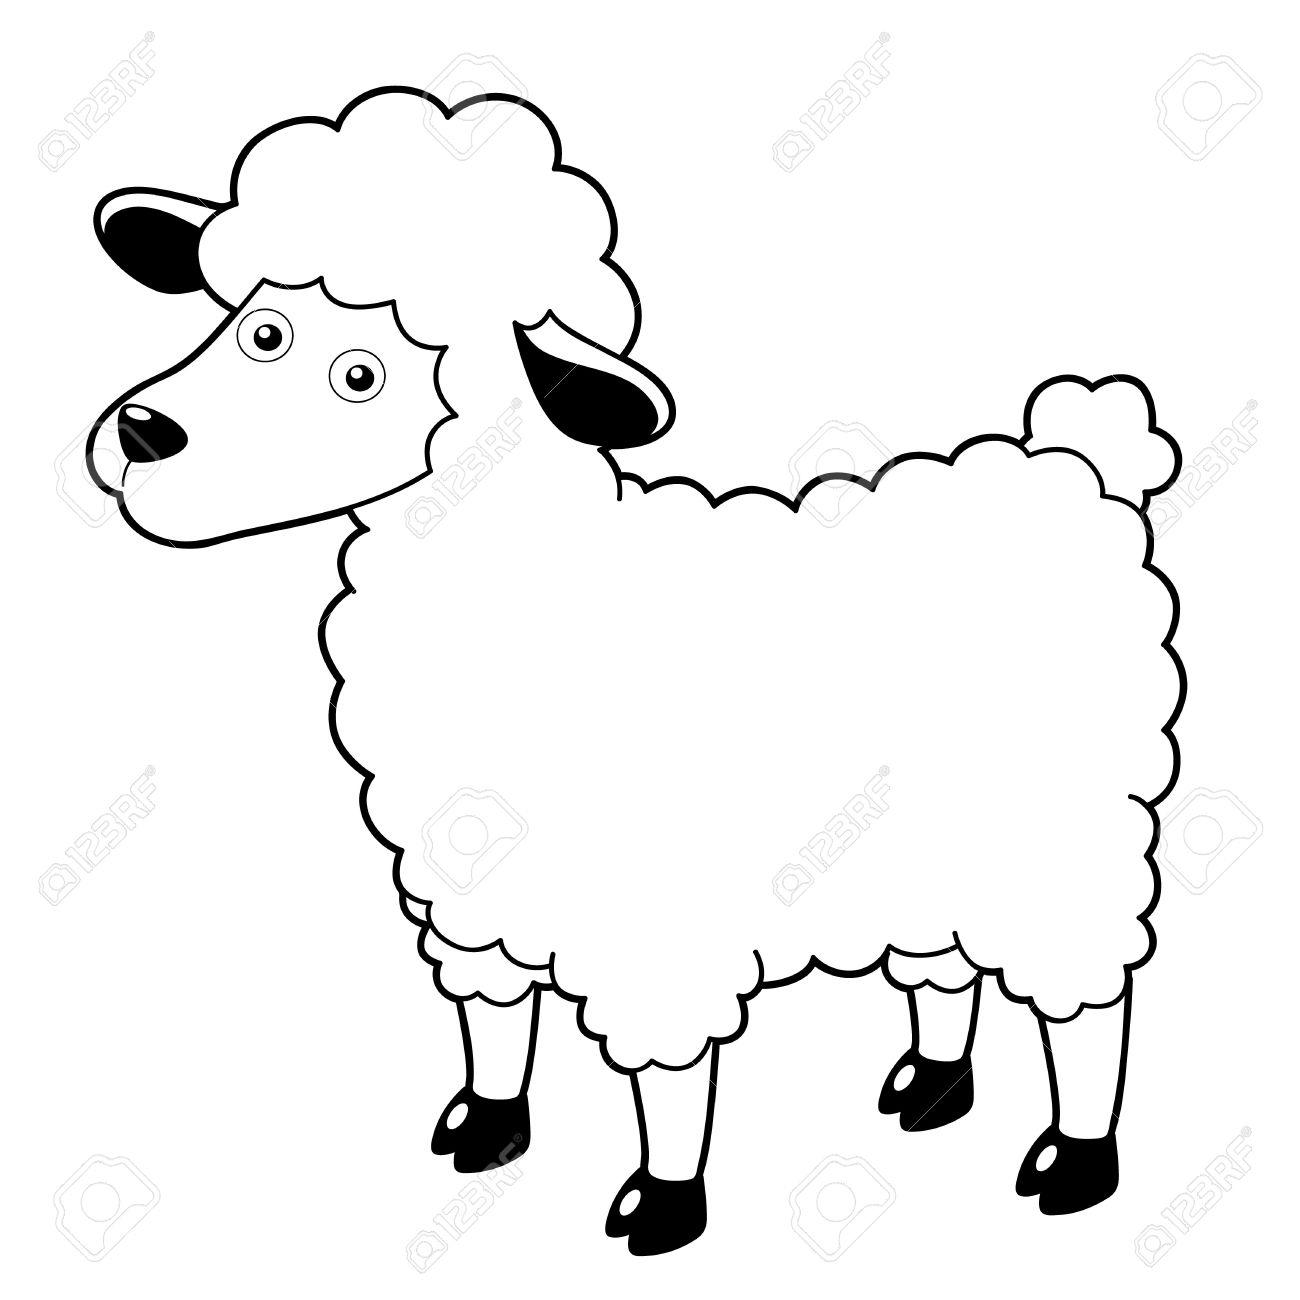 Lamb Cartoon Drawing at GetDrawings